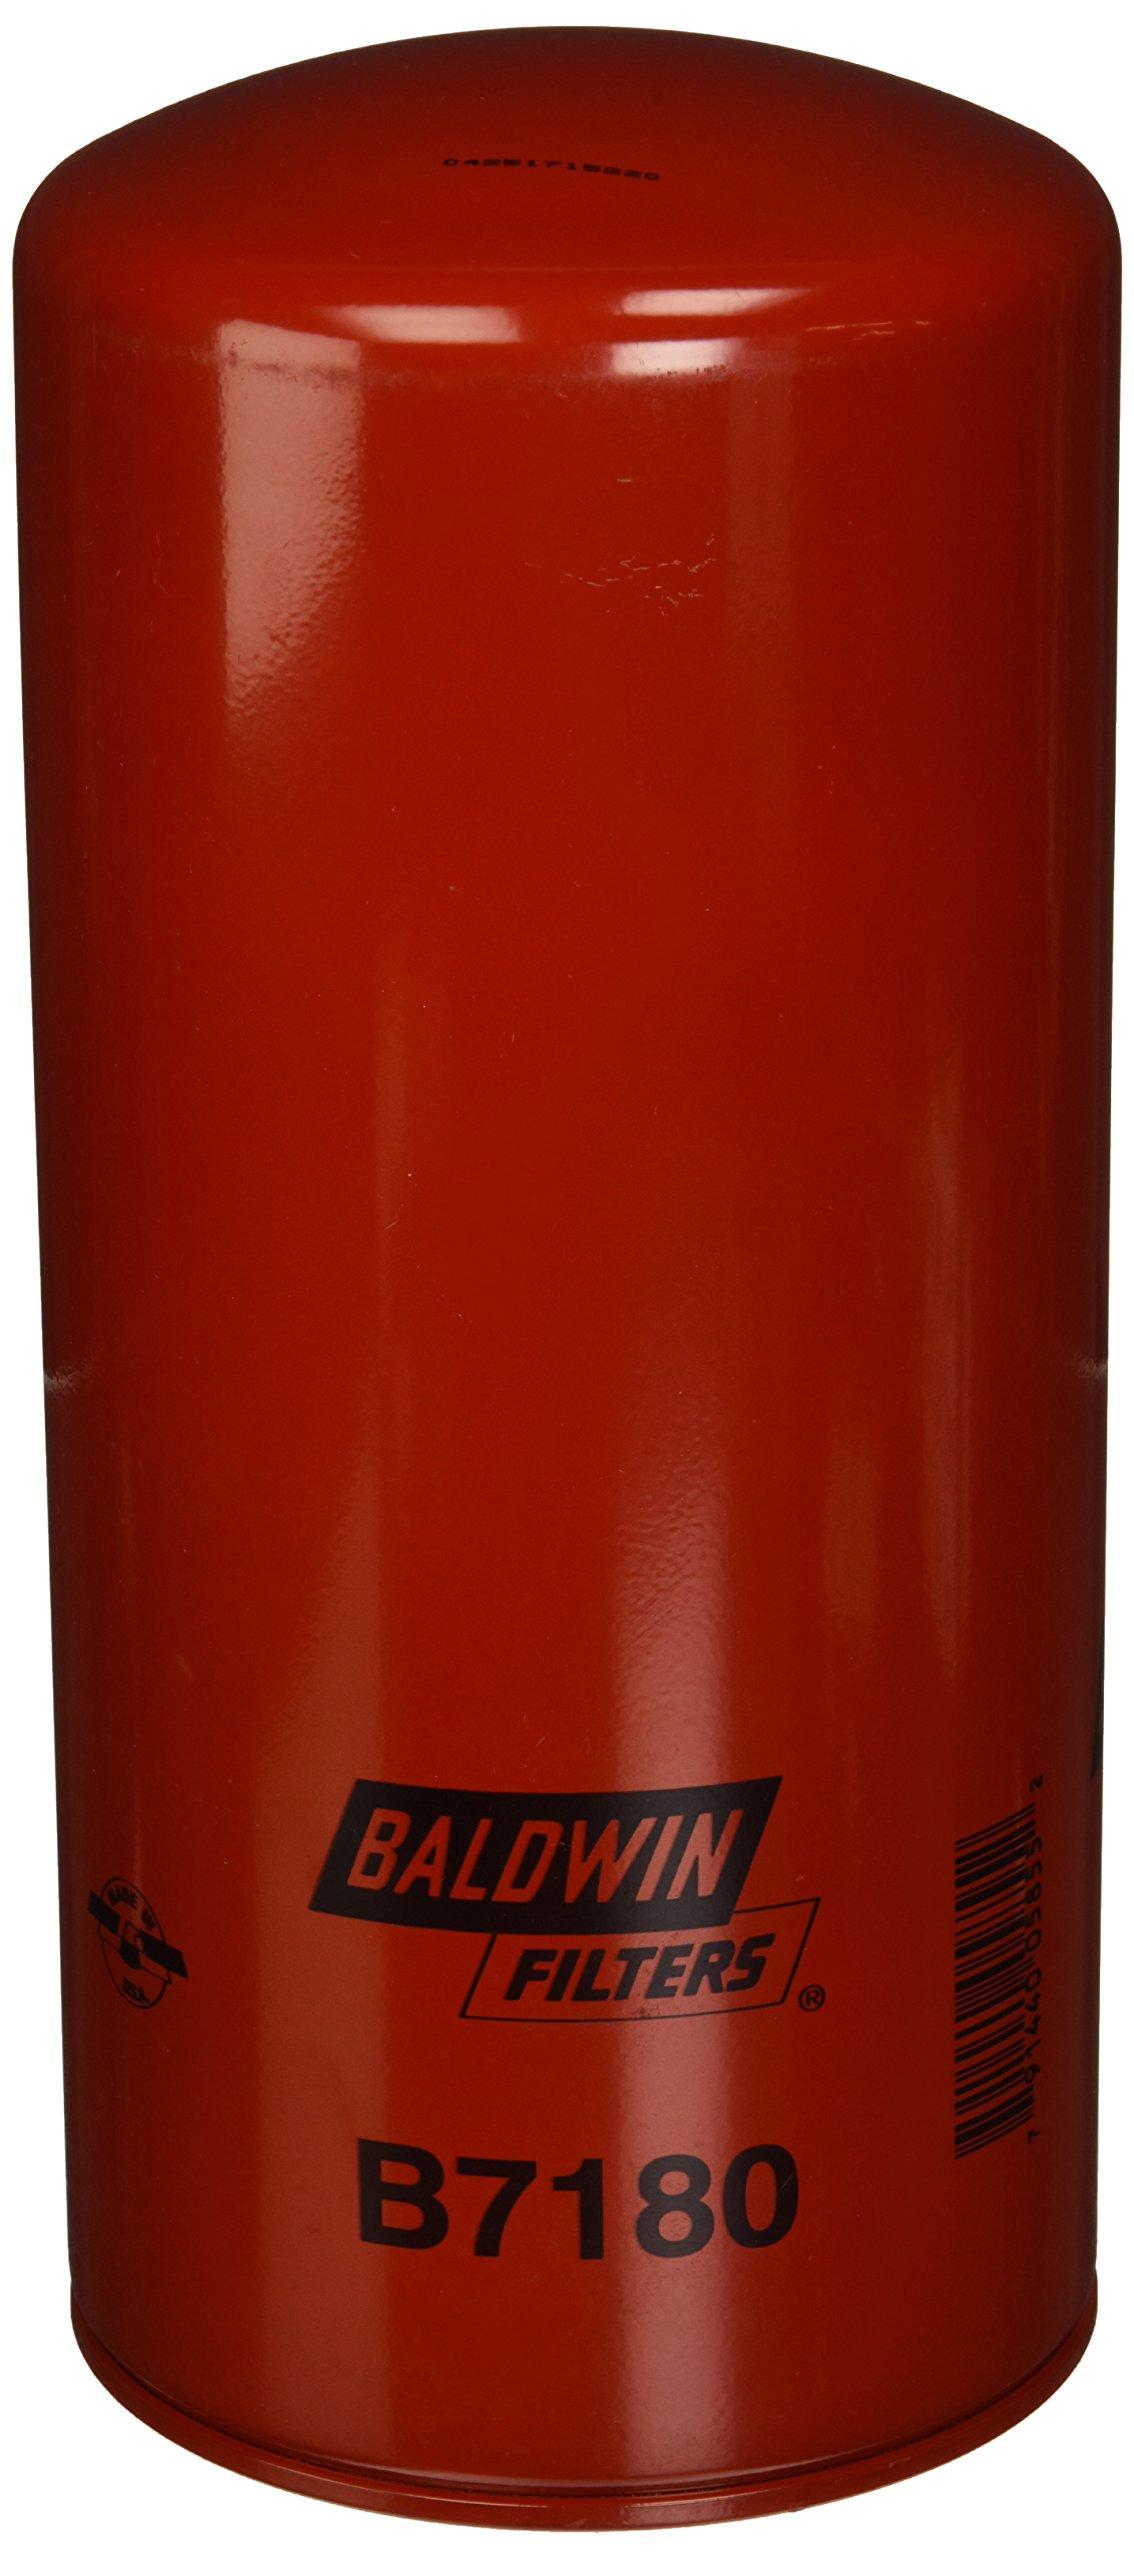 Baldwin B7180 Oil Filter by Baldwin